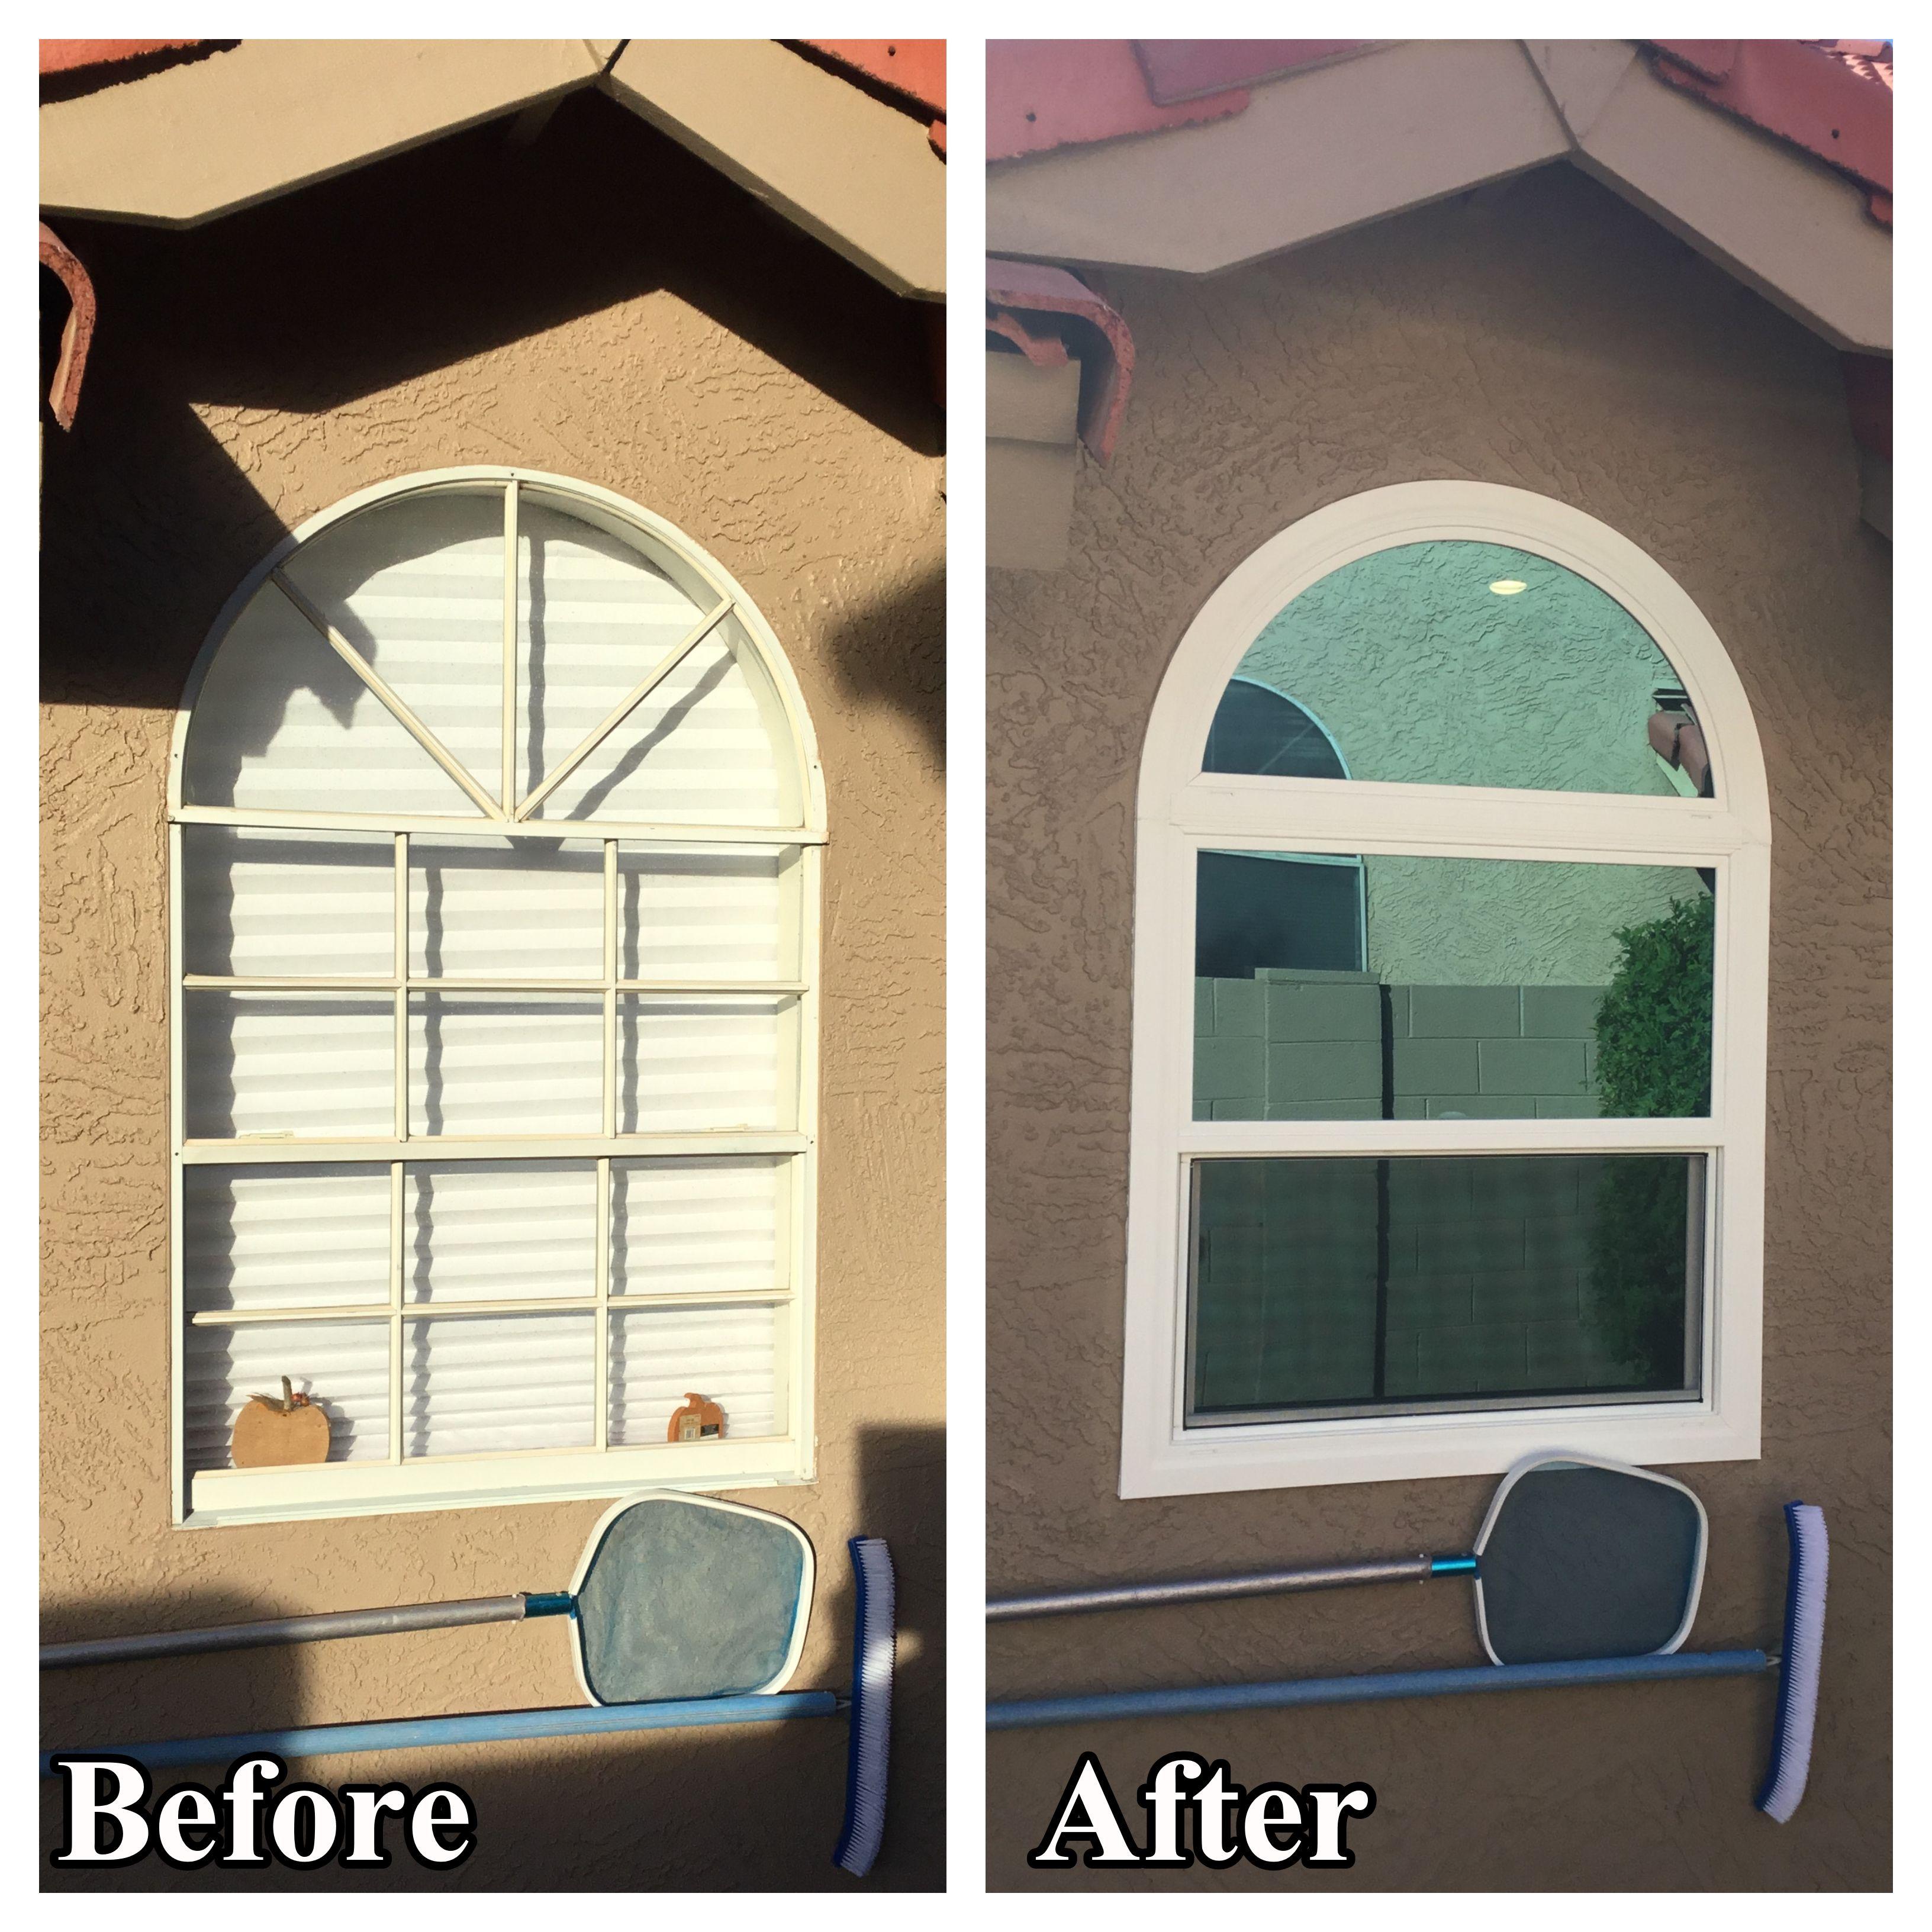 Before After New Energy Efficient Simonton Window In 2020 Windows Vinyl Replacement Windows Windows And Doors